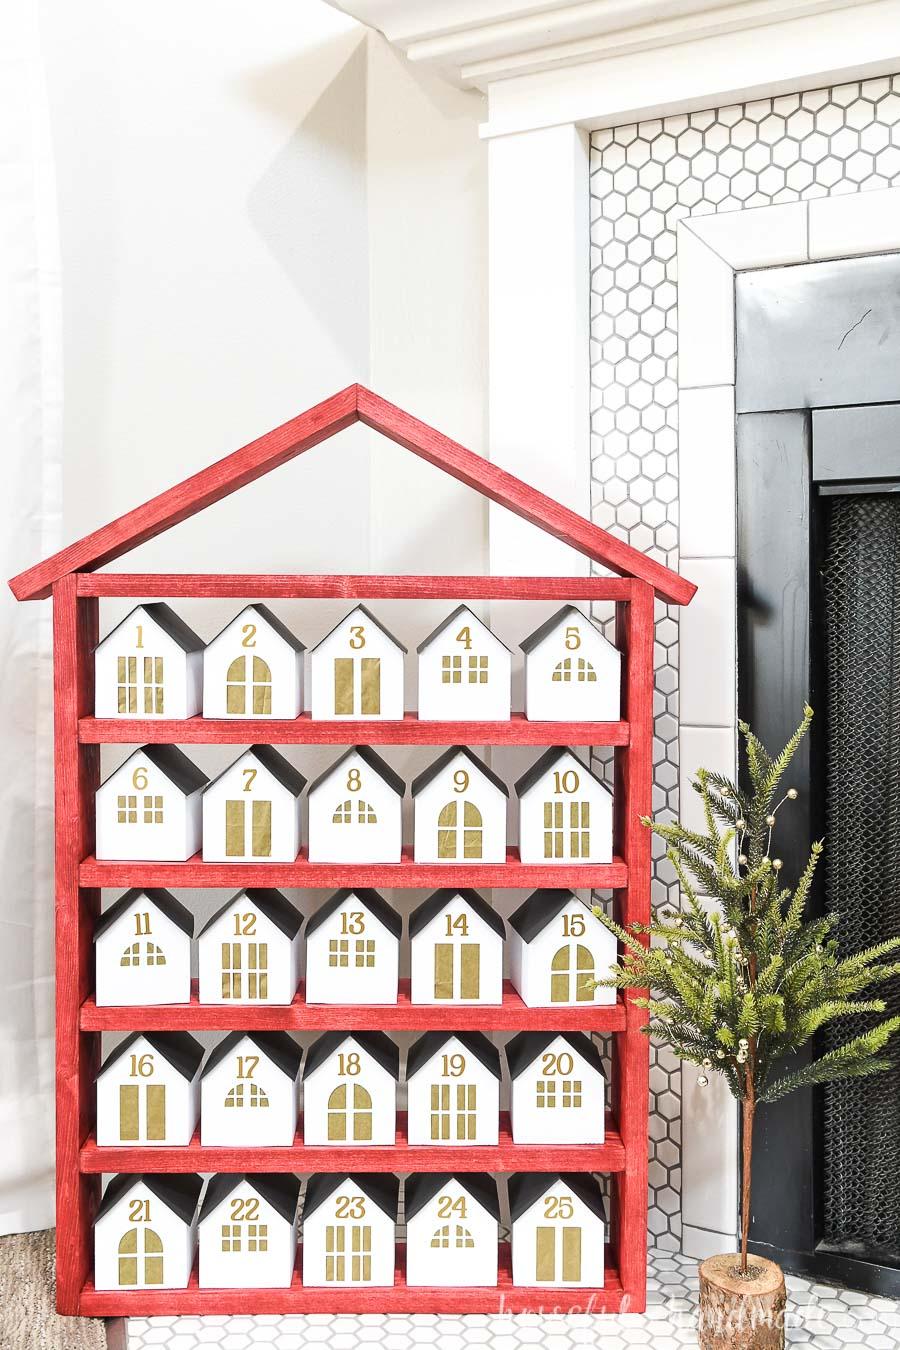 Diy Wooden Advent Calendar With Paper Houses In 2020 Wooden Advent Calendar Diy Advent Calendar Advent Calendar House